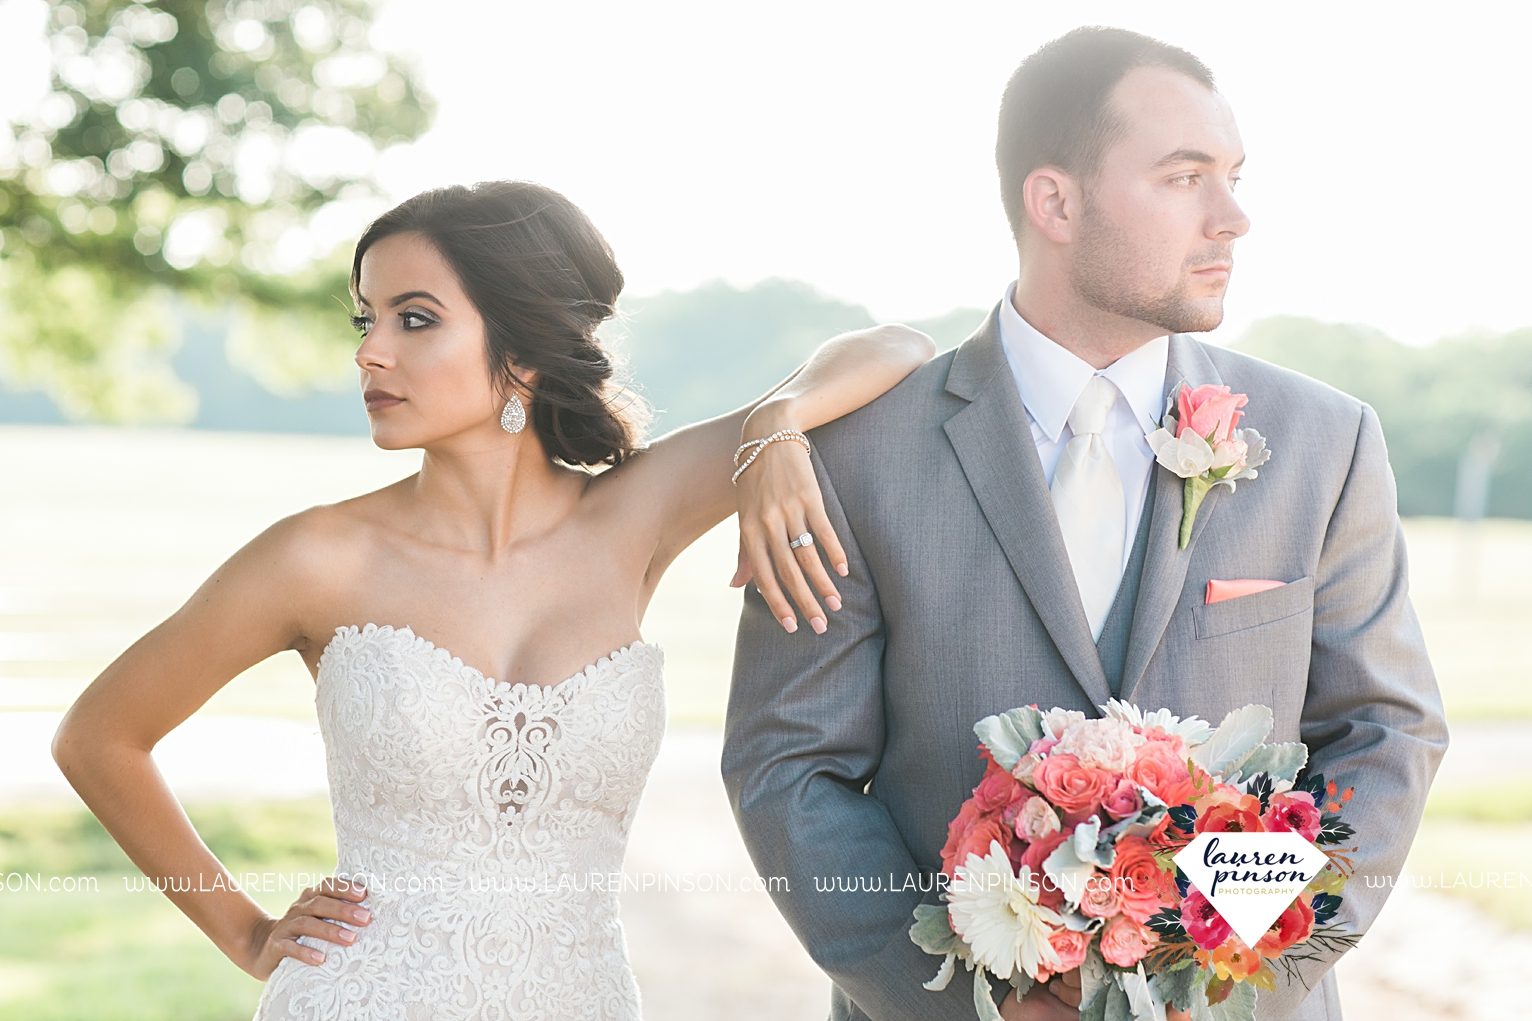 wichita-falls-wedding-nocona-comanche-rose-ranch-rustic-pink-gray-photography-00164.jpg